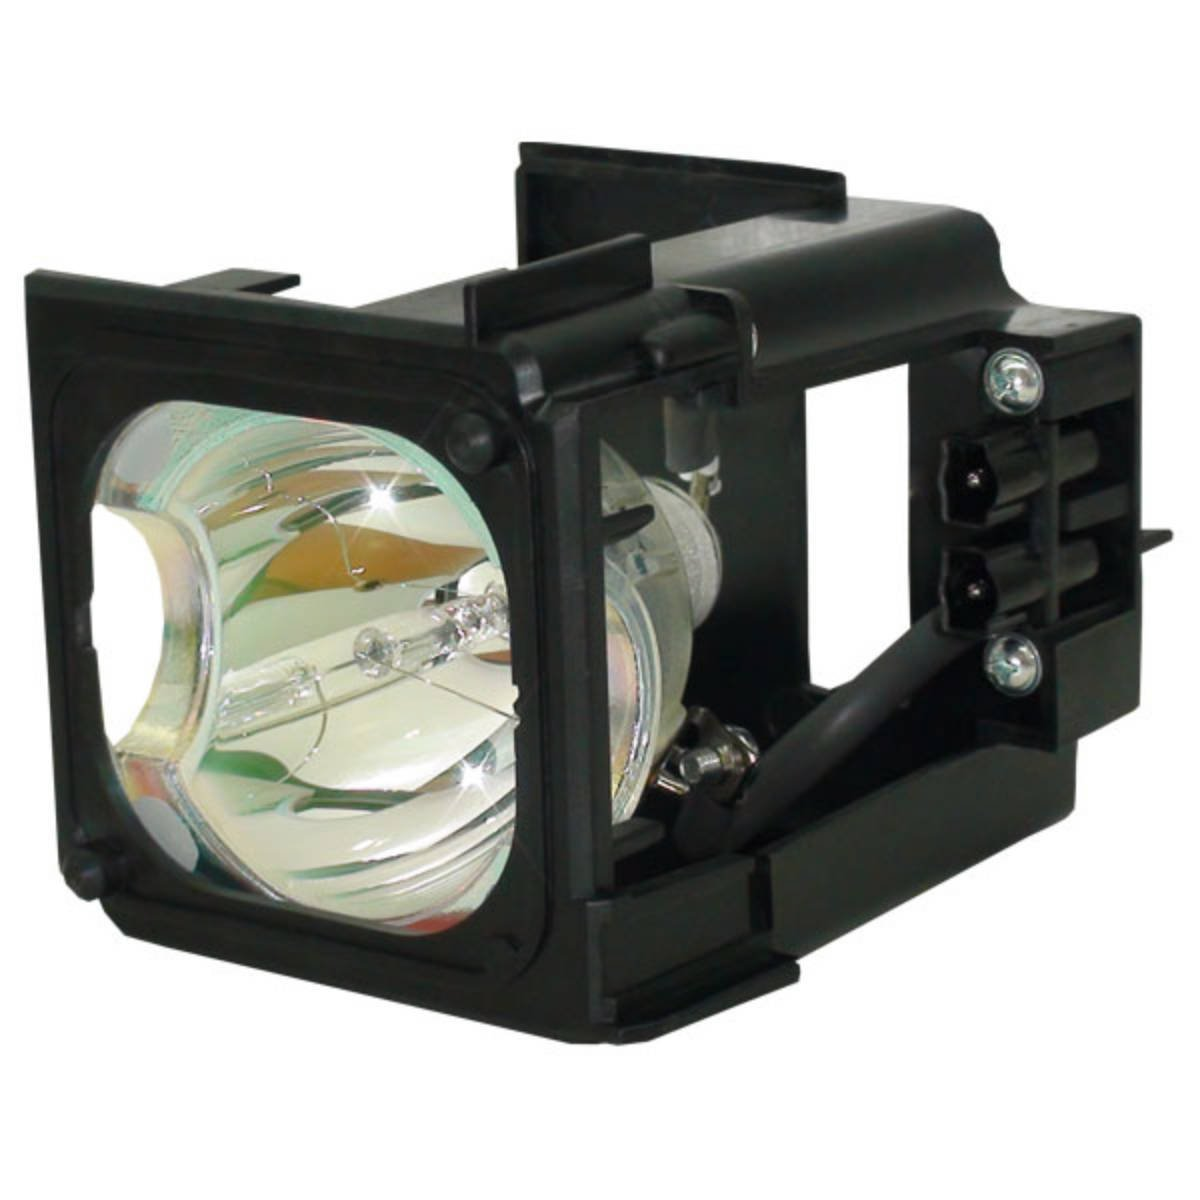 size regarding inspire lamps tv x dlp bulb lamp light ideas replacement mitsubishi